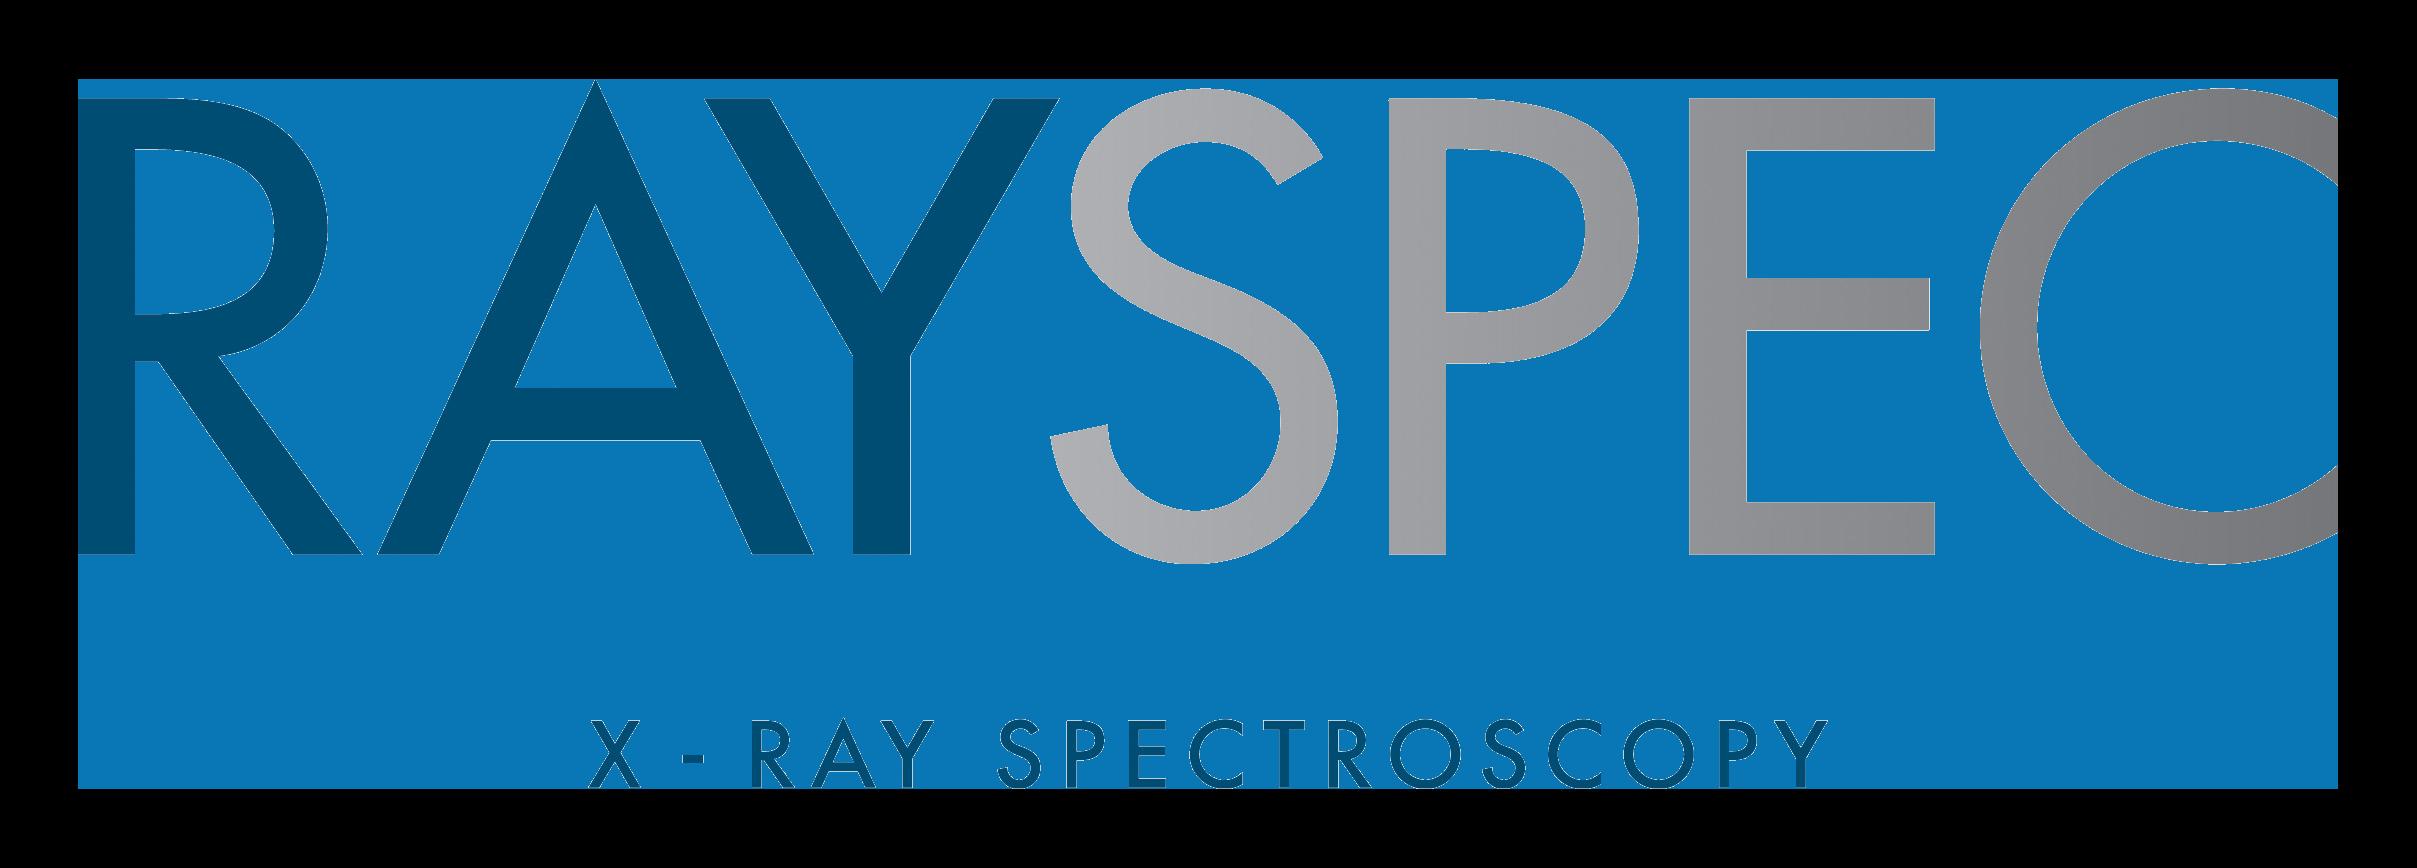 Rayspec logo image